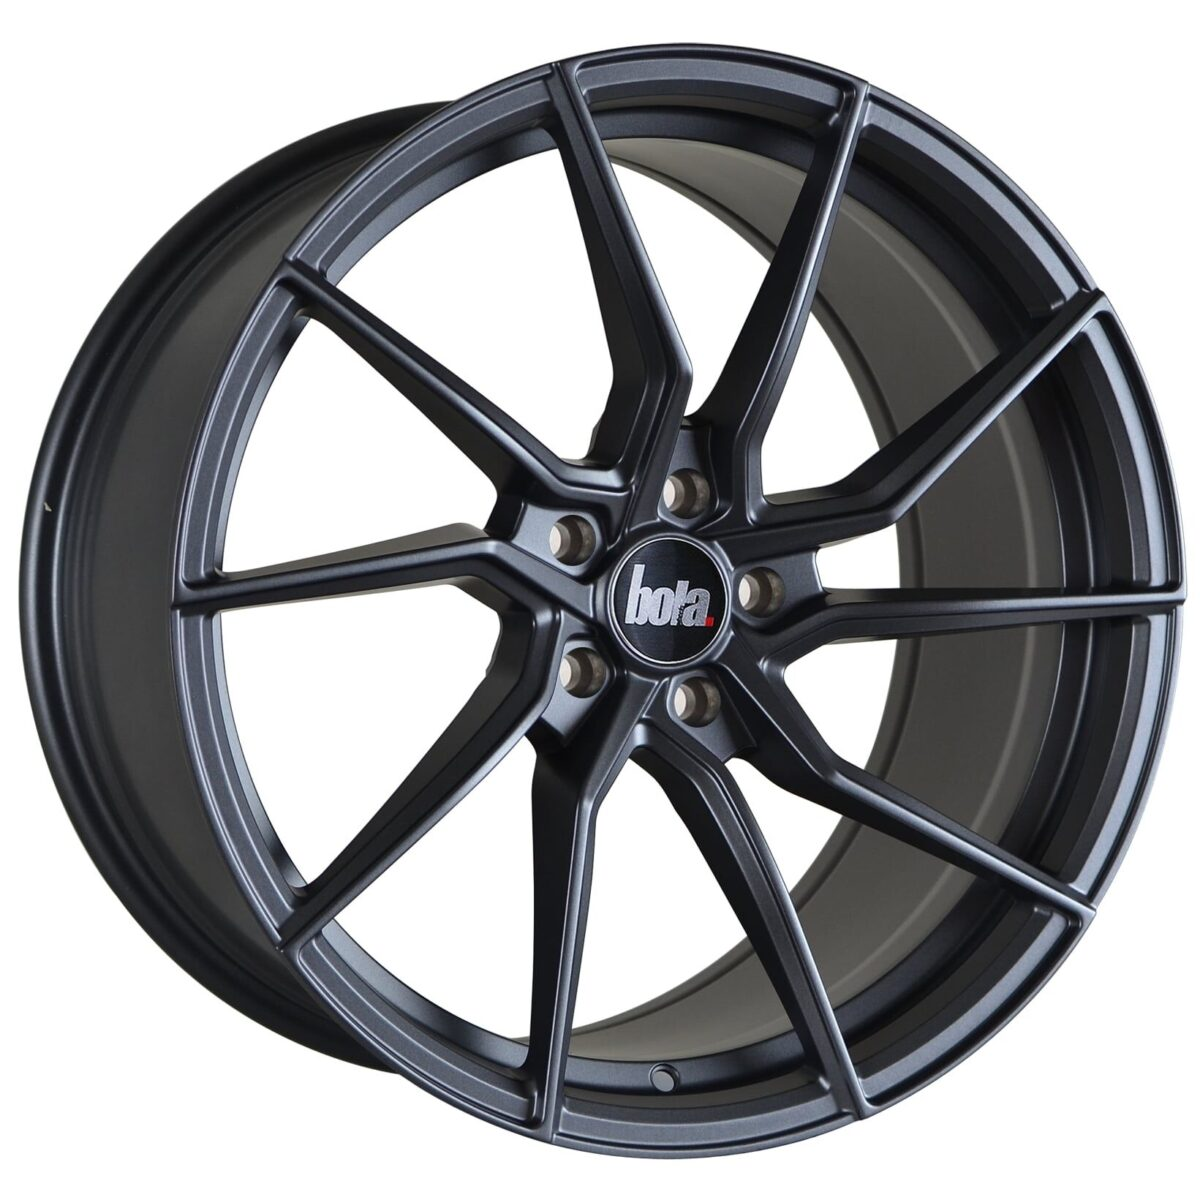 "19"" BOLA B25 Wheels - Matt Gunmetal - VW / Audi / Mercedes - 5x112"